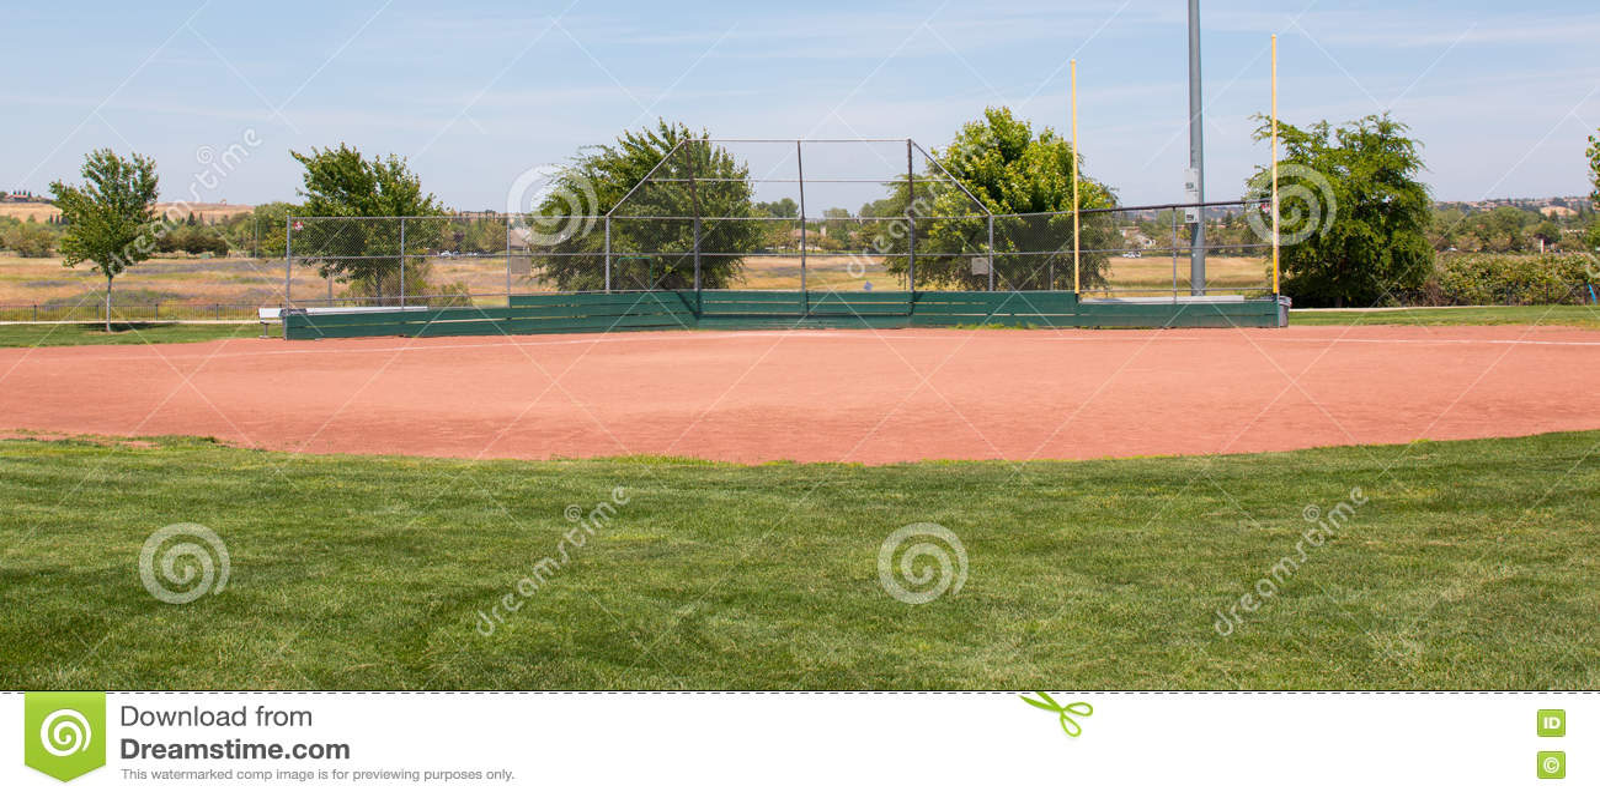 Baseballfältliga little